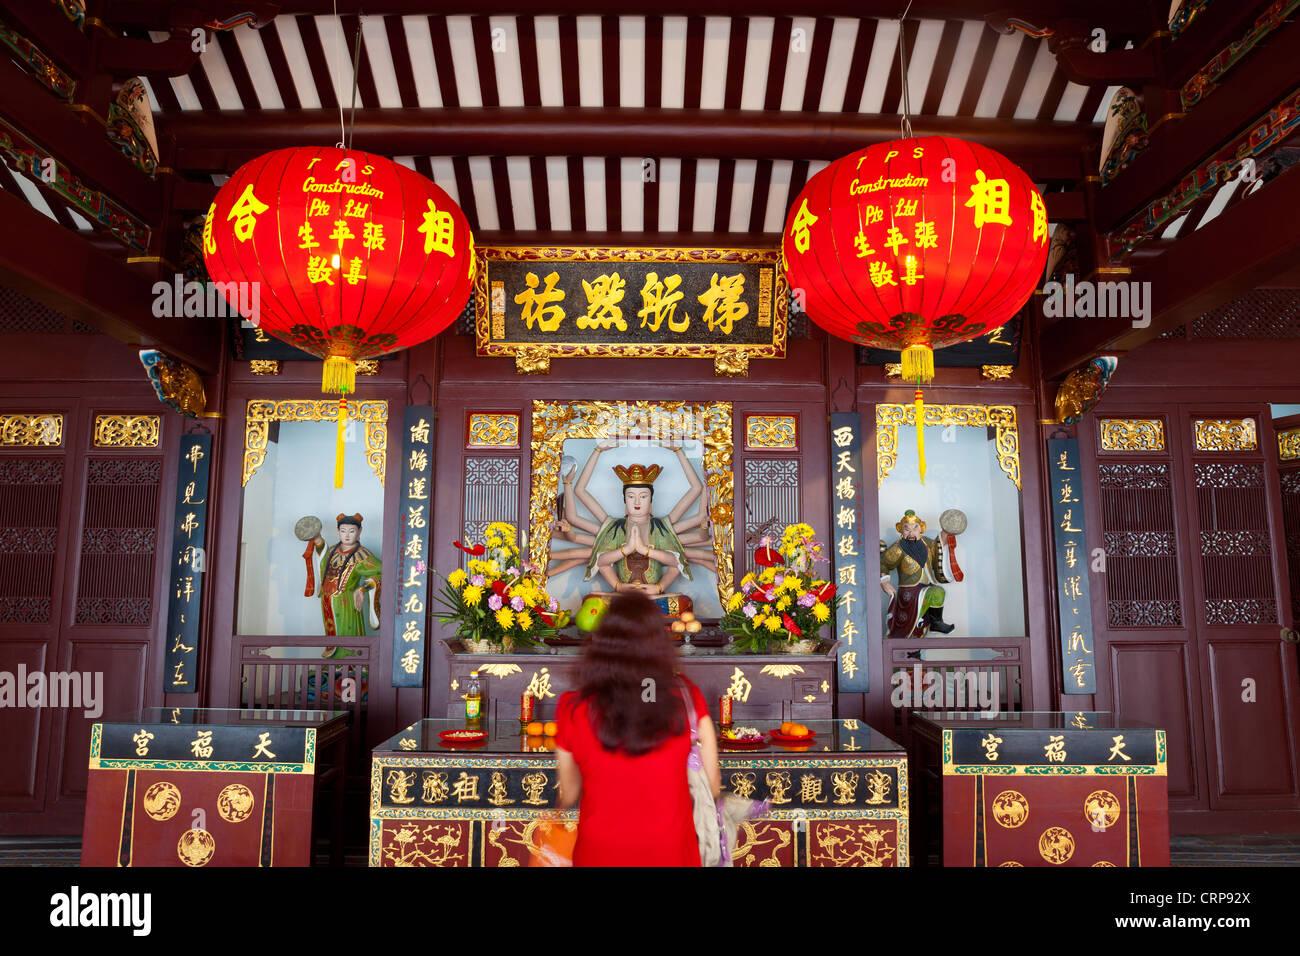 Interior of the Thian Hock Keng Chinese Hokkien Temple in Telok Ayer Street in Singapore - Stock Image